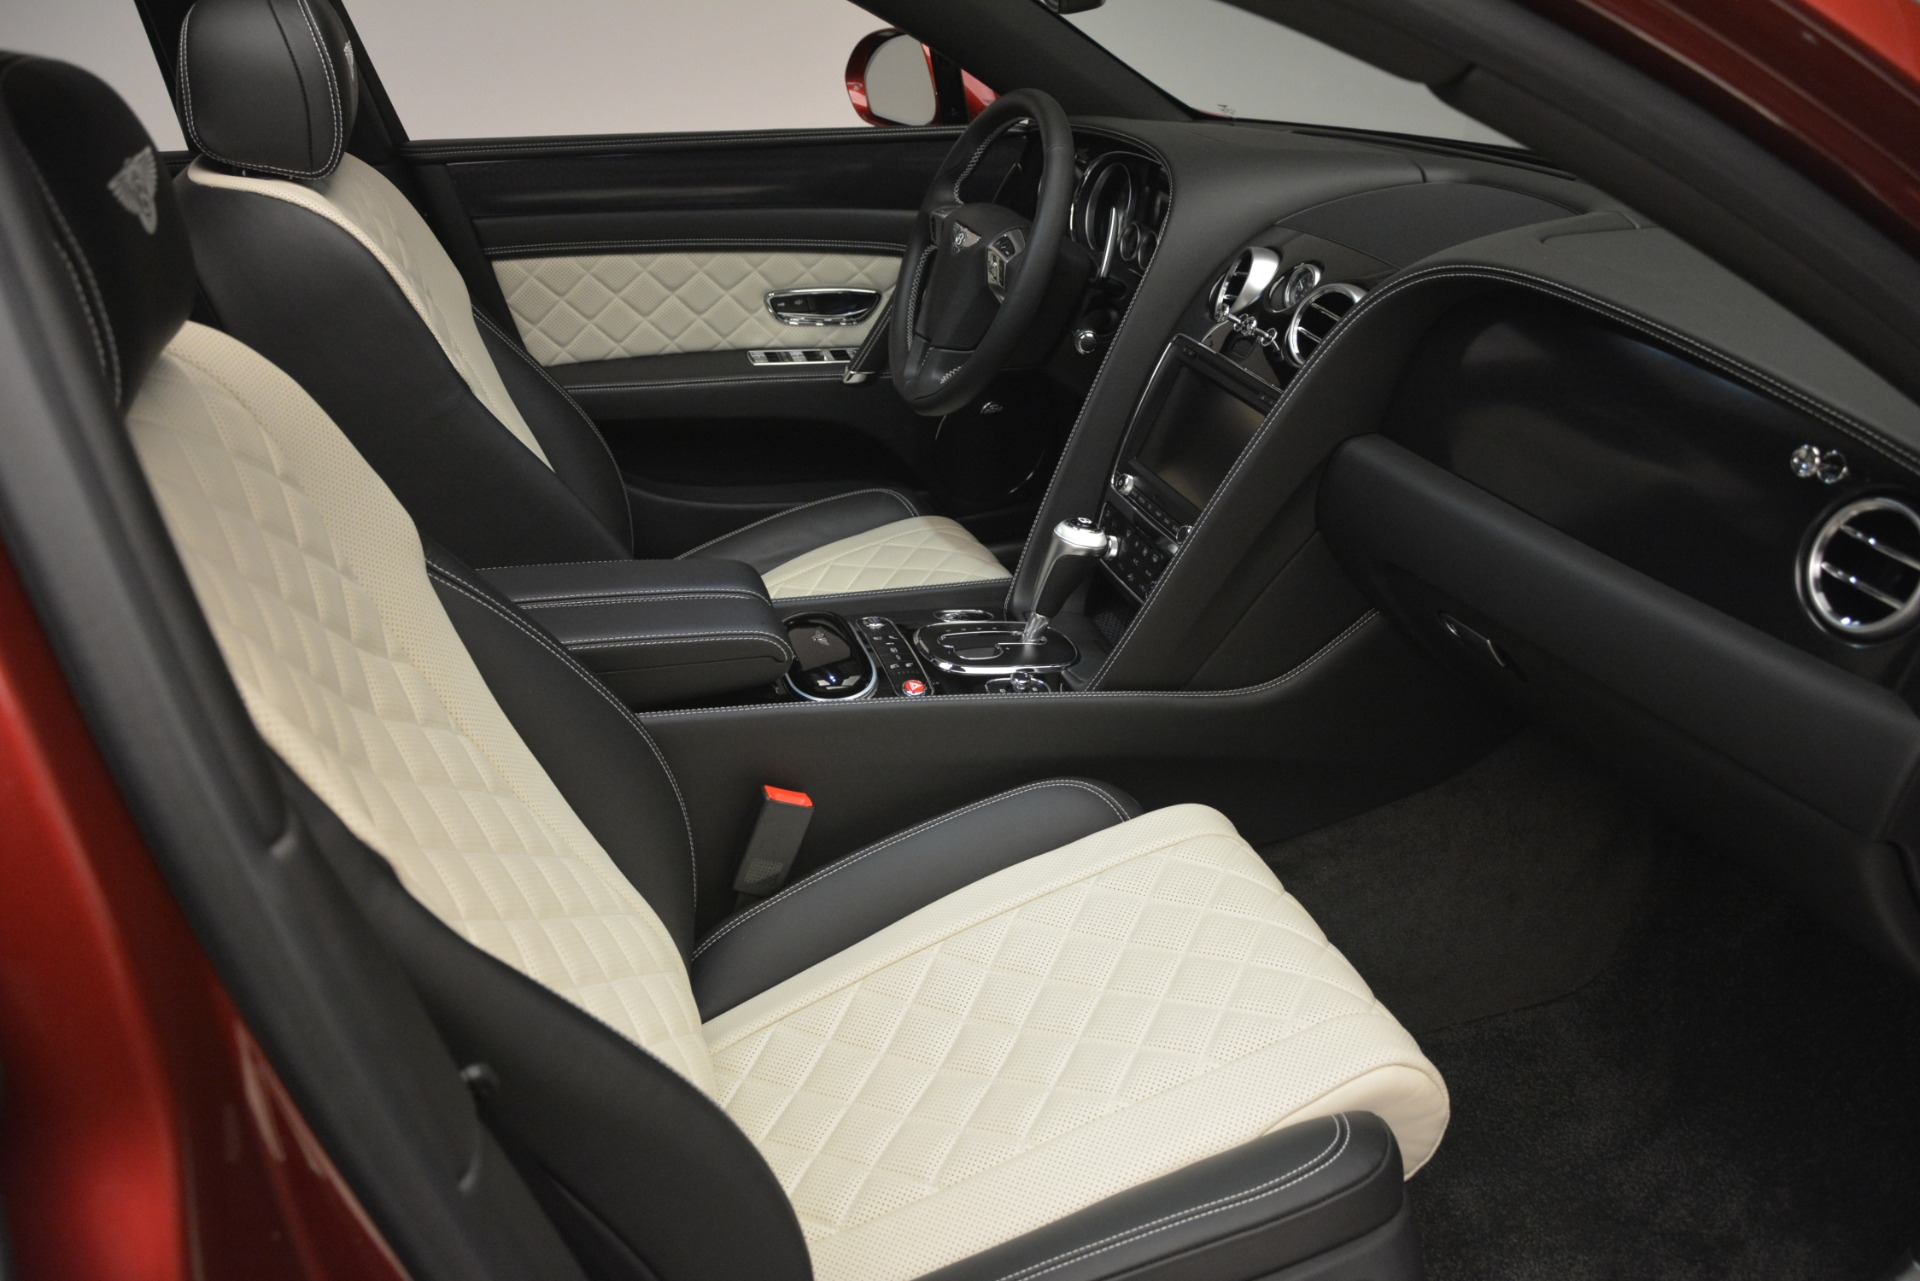 Used 2018 Bentley Flying Spur W12 S For Sale In Westport, CT 3014_p29